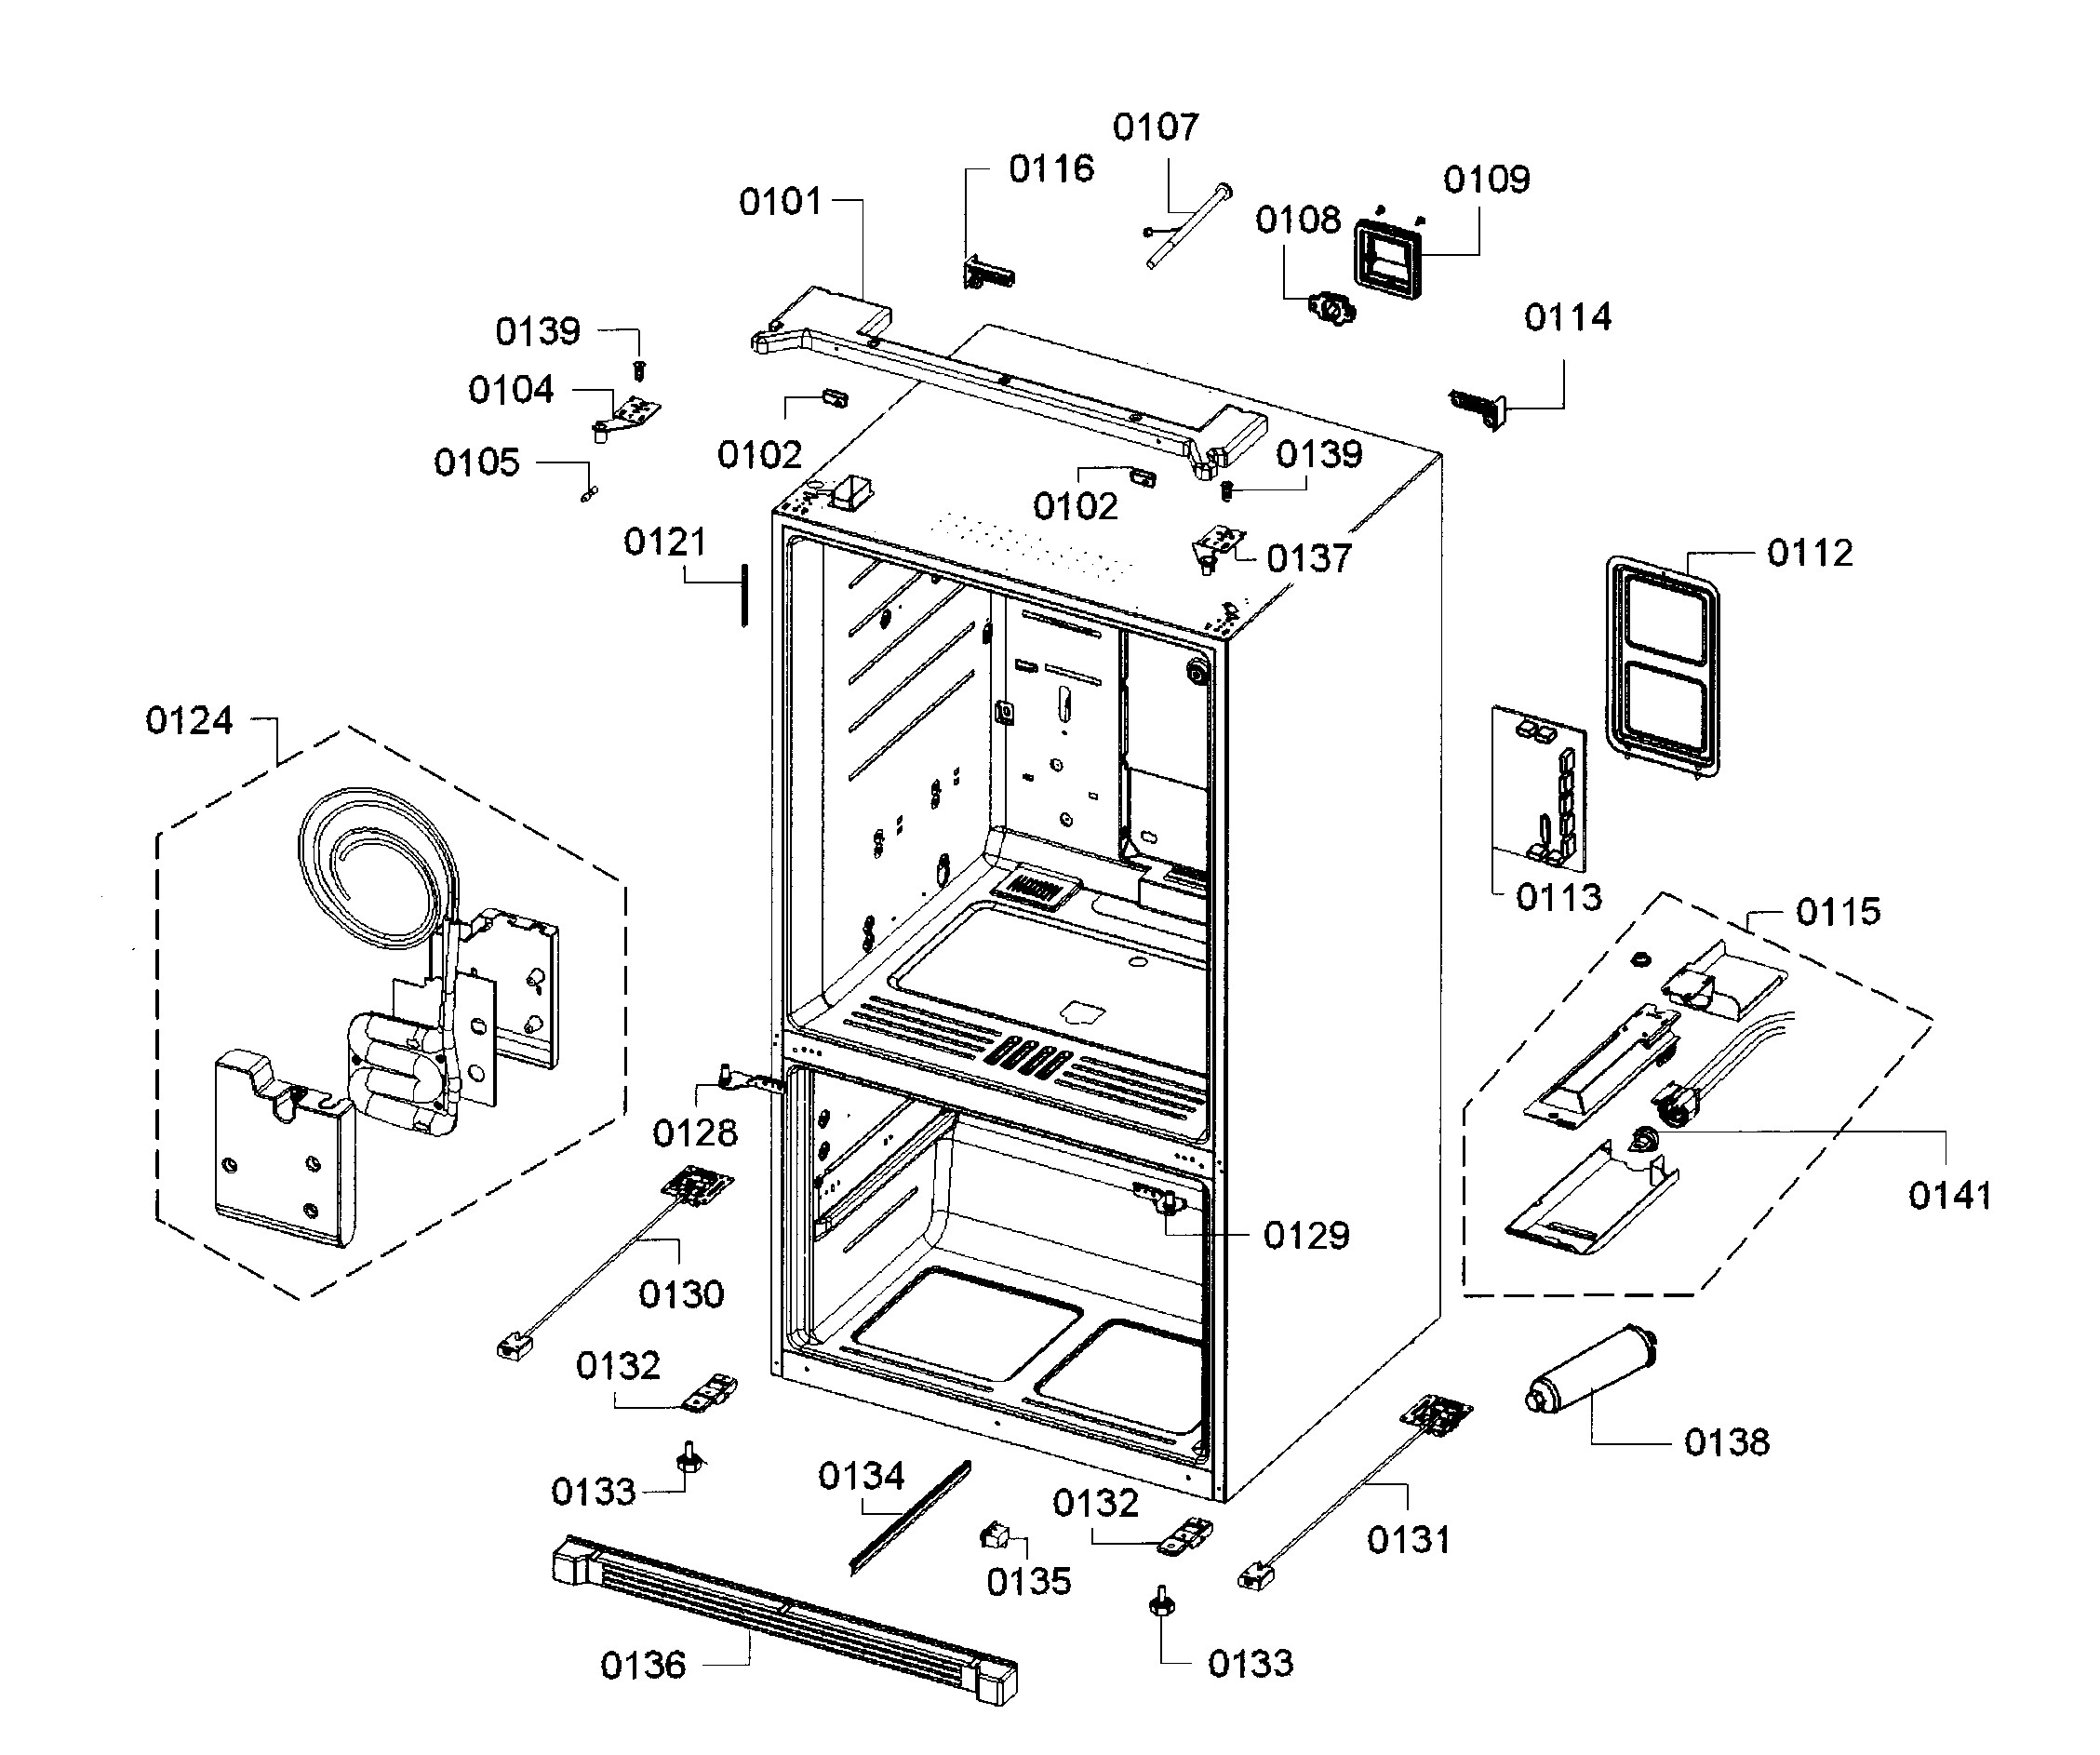 bosch jigsaw parts diagram